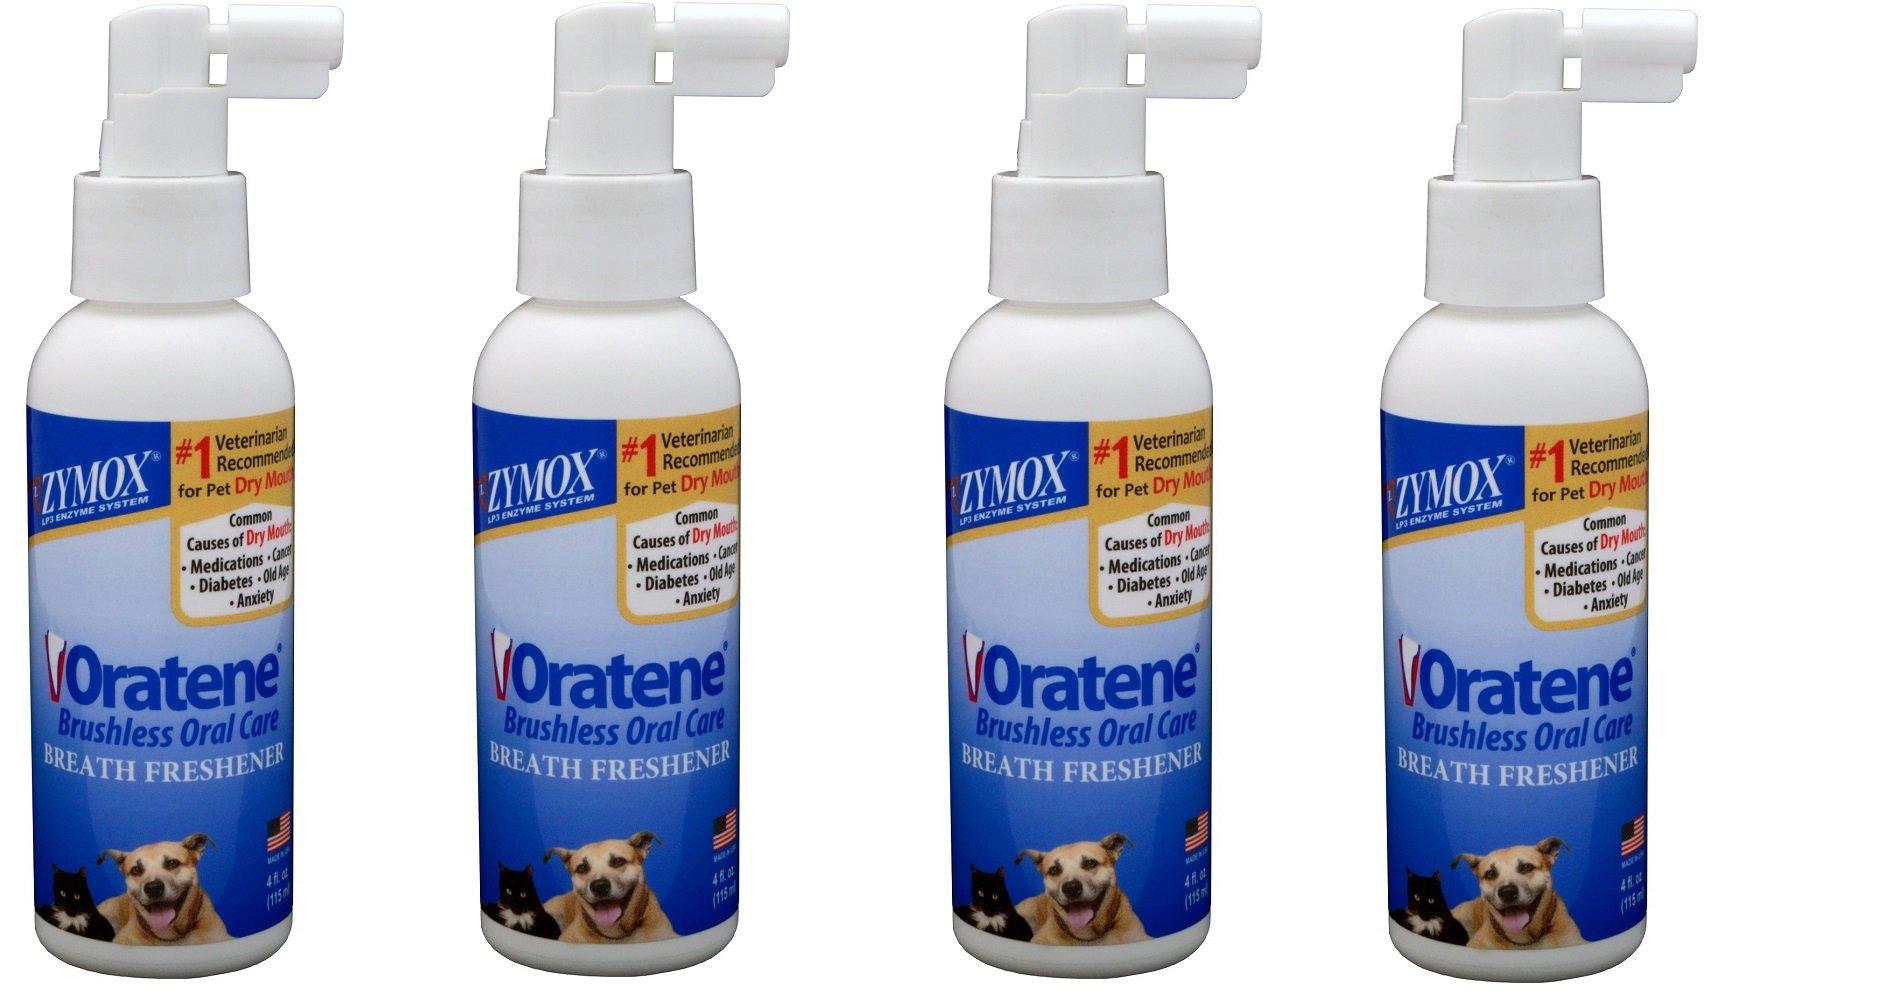 Oratene Breath Freshener (4 oz) (4 pack)